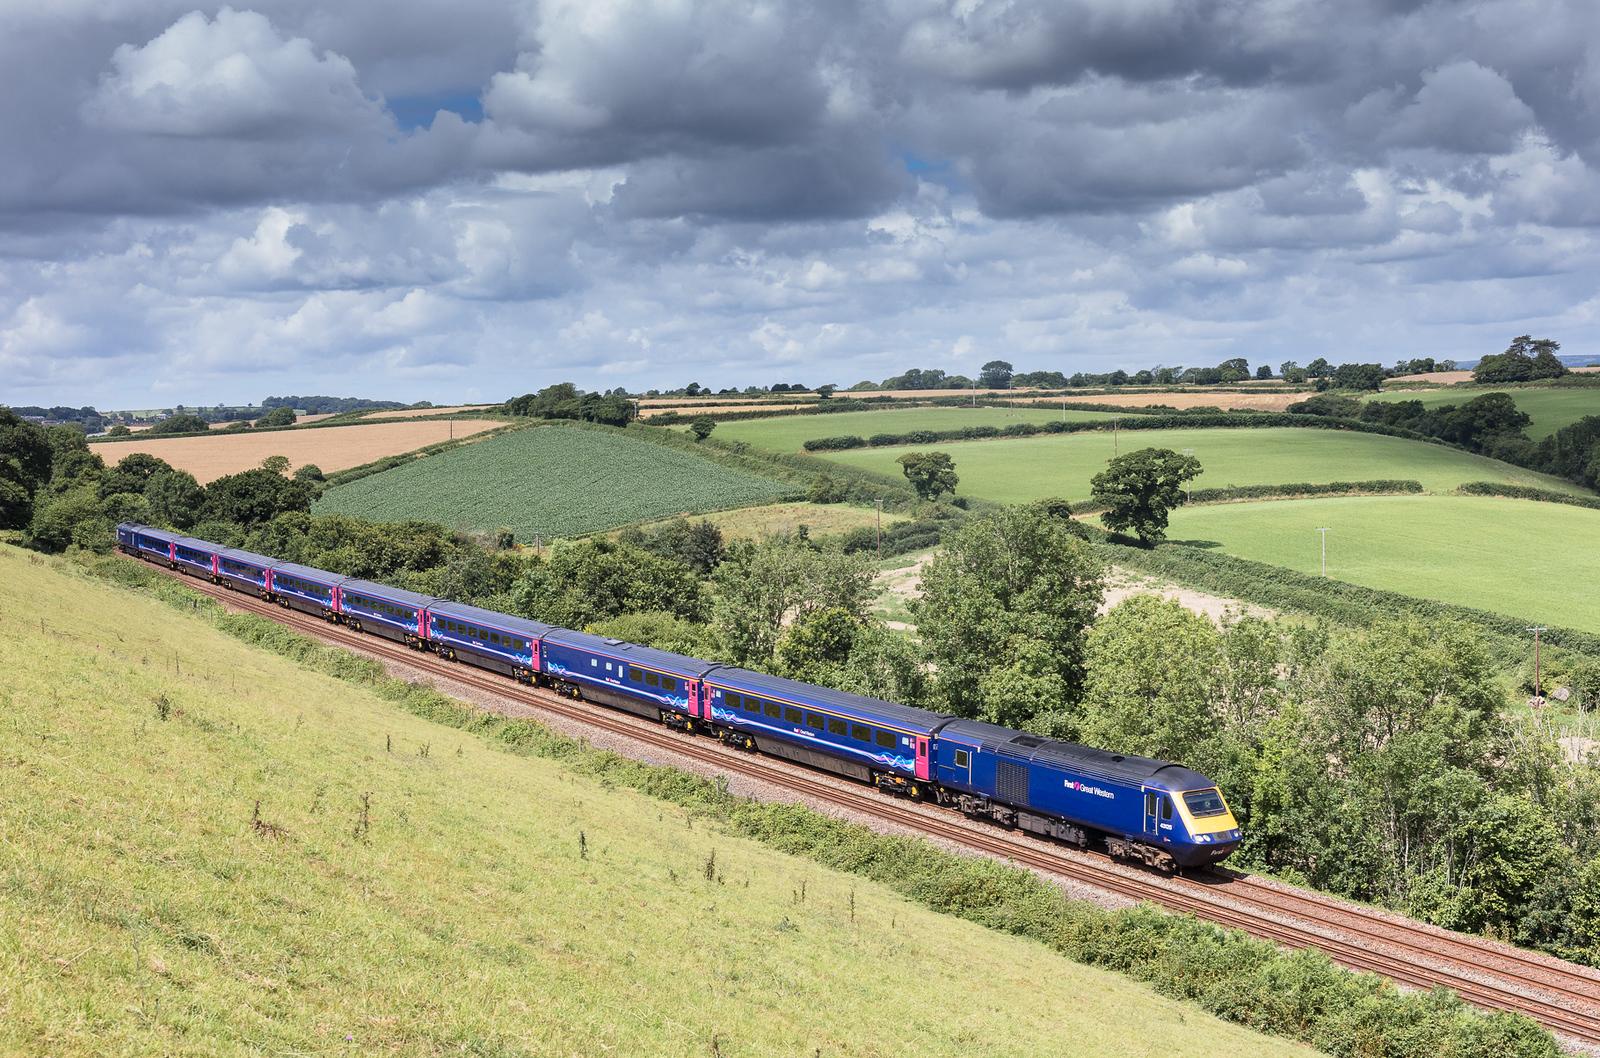 200717  43125 heads the 1A85 1047 Penzance to London Paddington downgrade near Treboul.